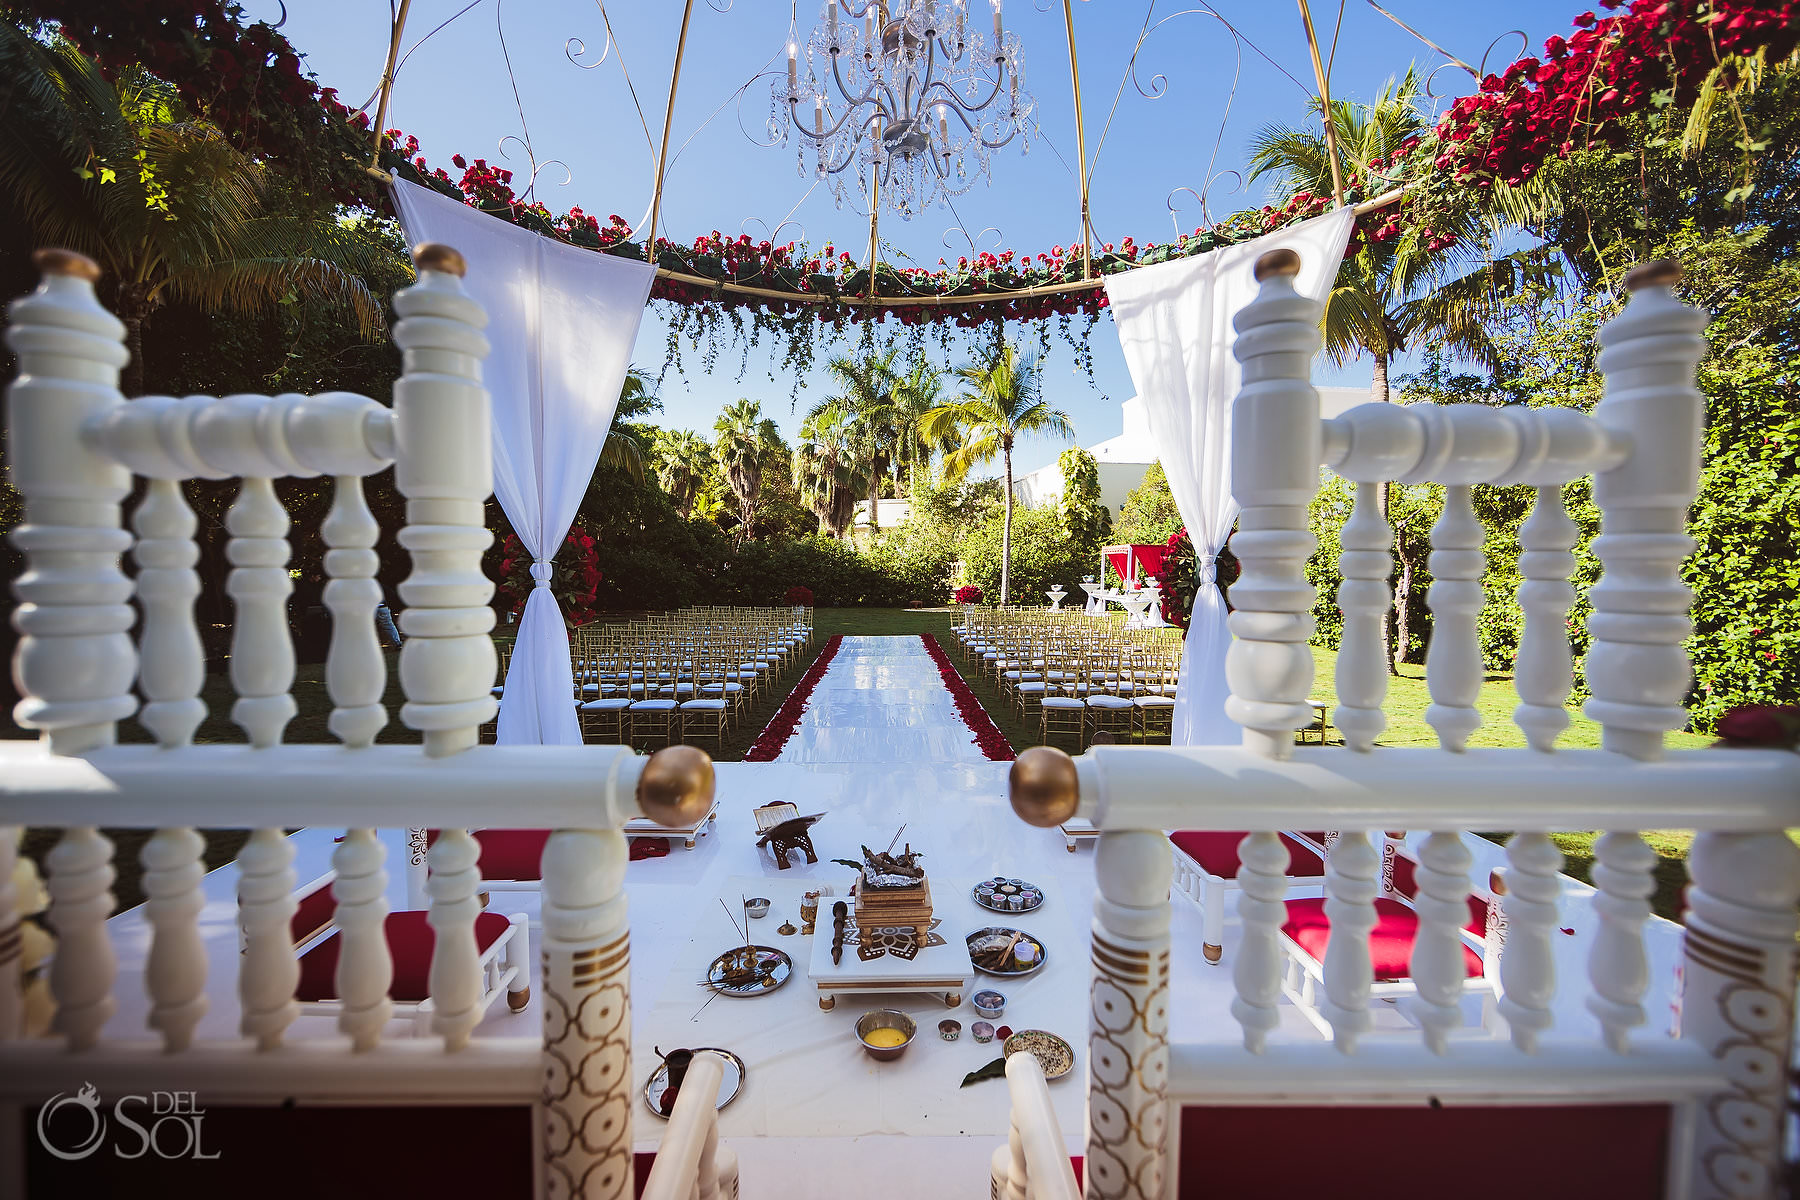 Mexico South Asian Wedding Setup Shaadi Package Mandap Dreams Tulum Dreams Garden Riviera Maya